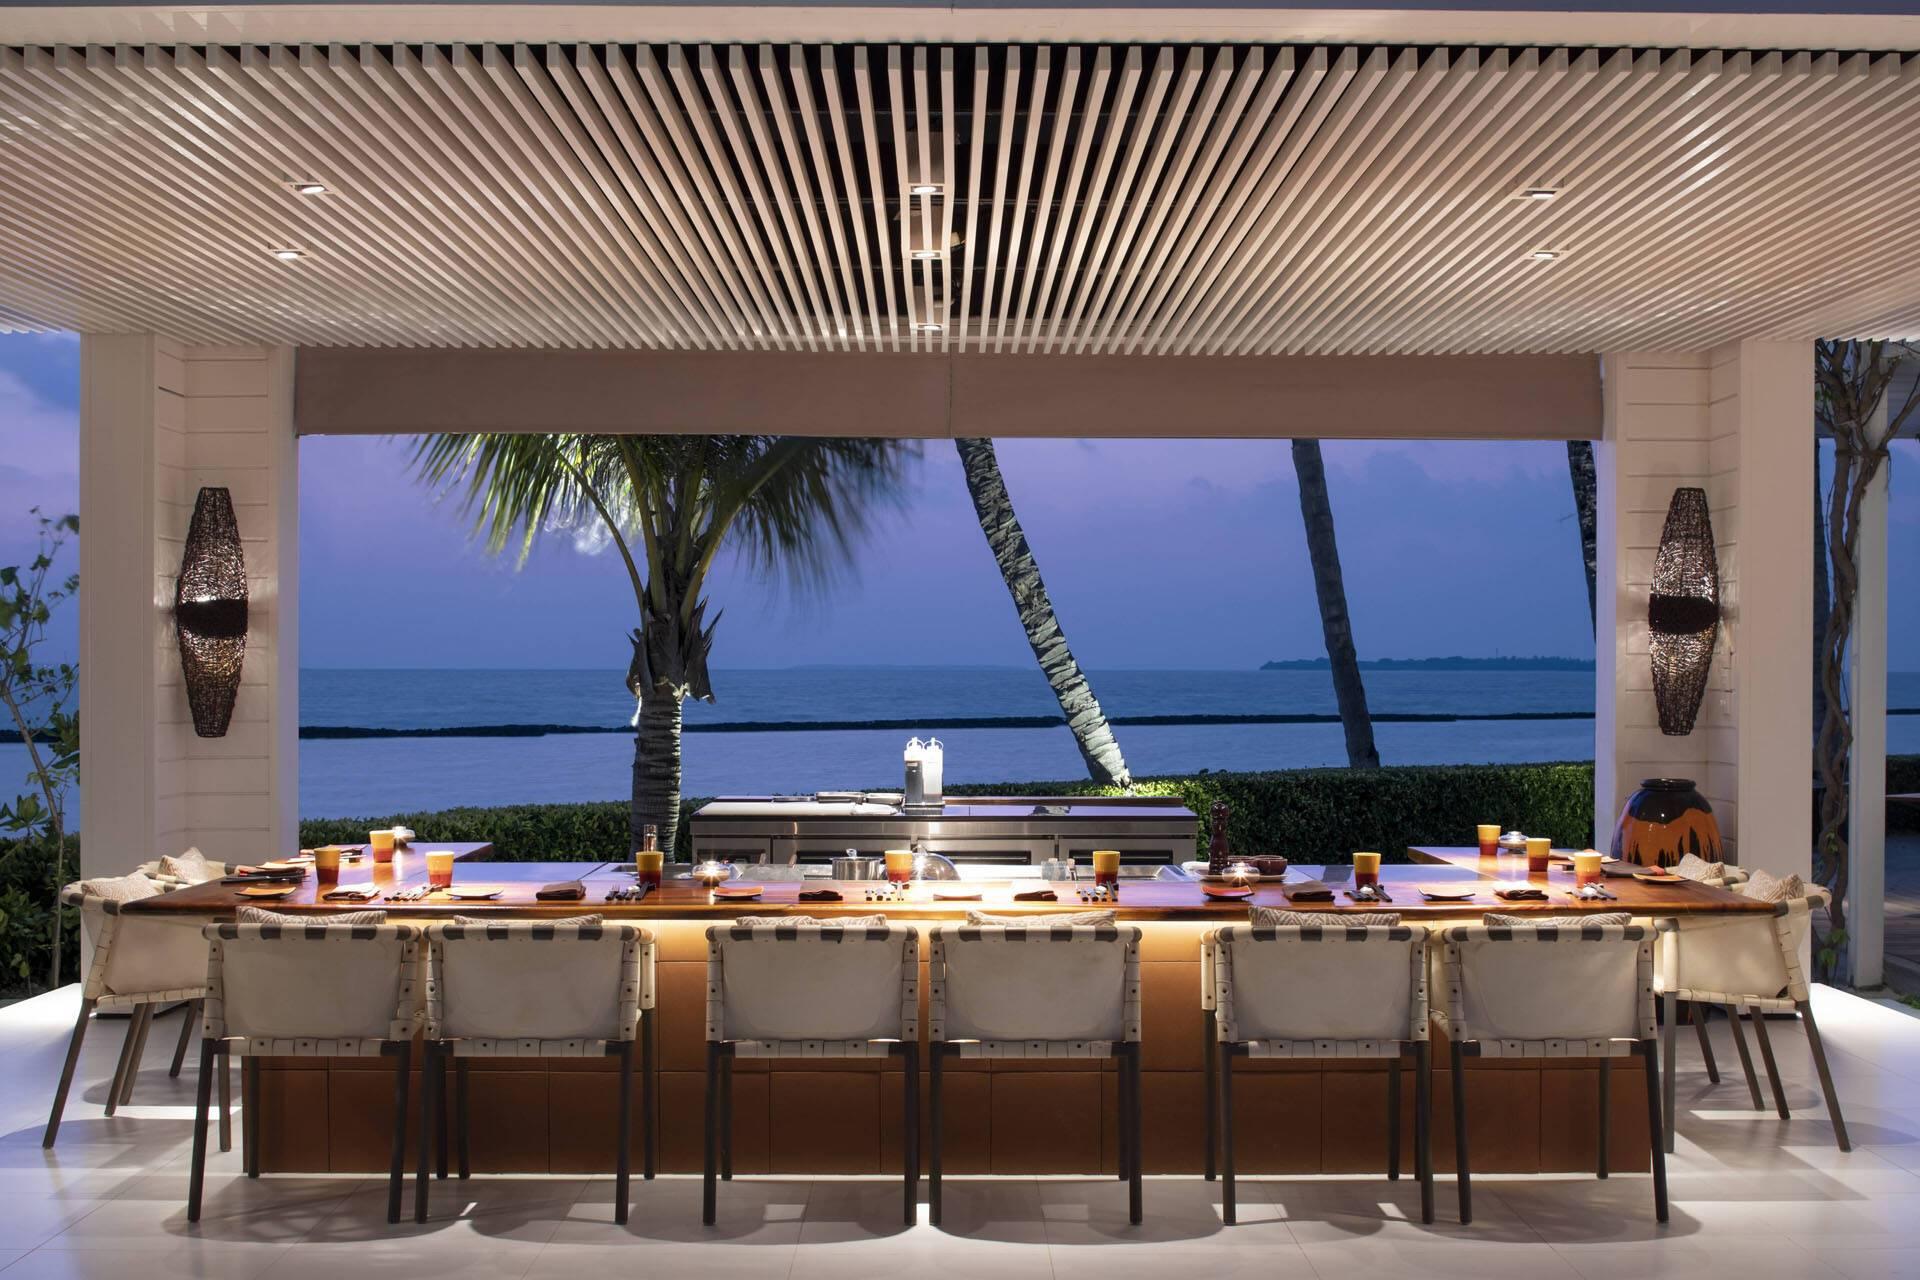 Cheval Blanc Randheli Maldives Diptyque Restaurant S Candito